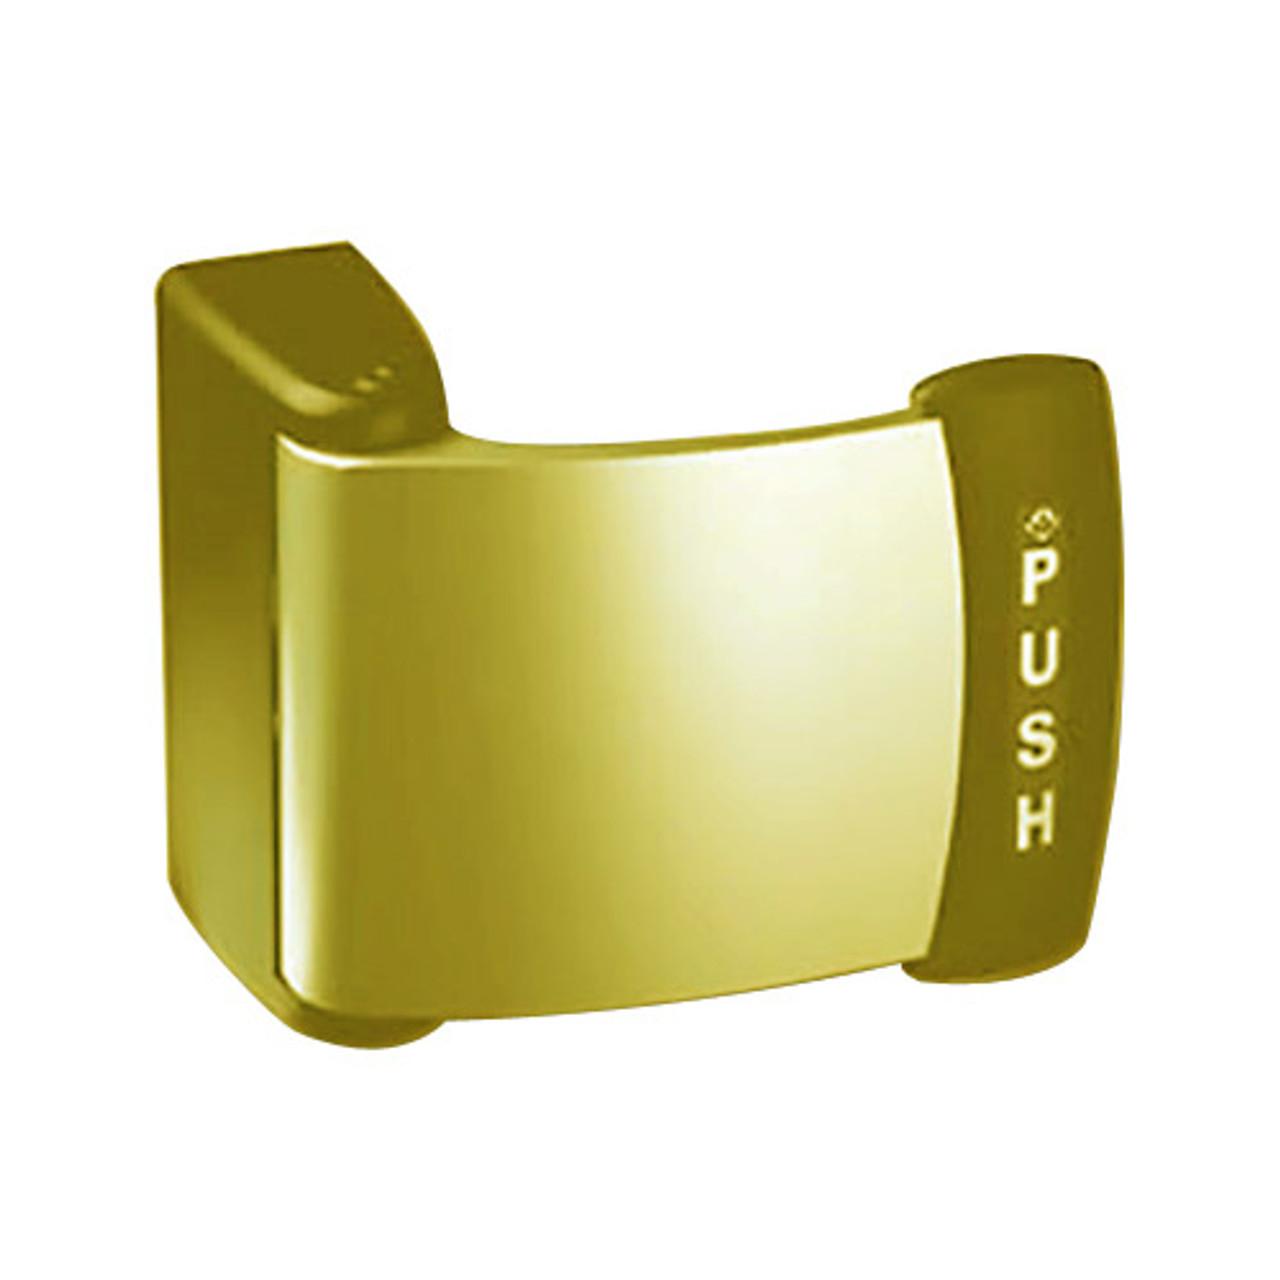 4591-13-02-US3 Adams Rite Deadlatch Paddle in Bright Brass Finish